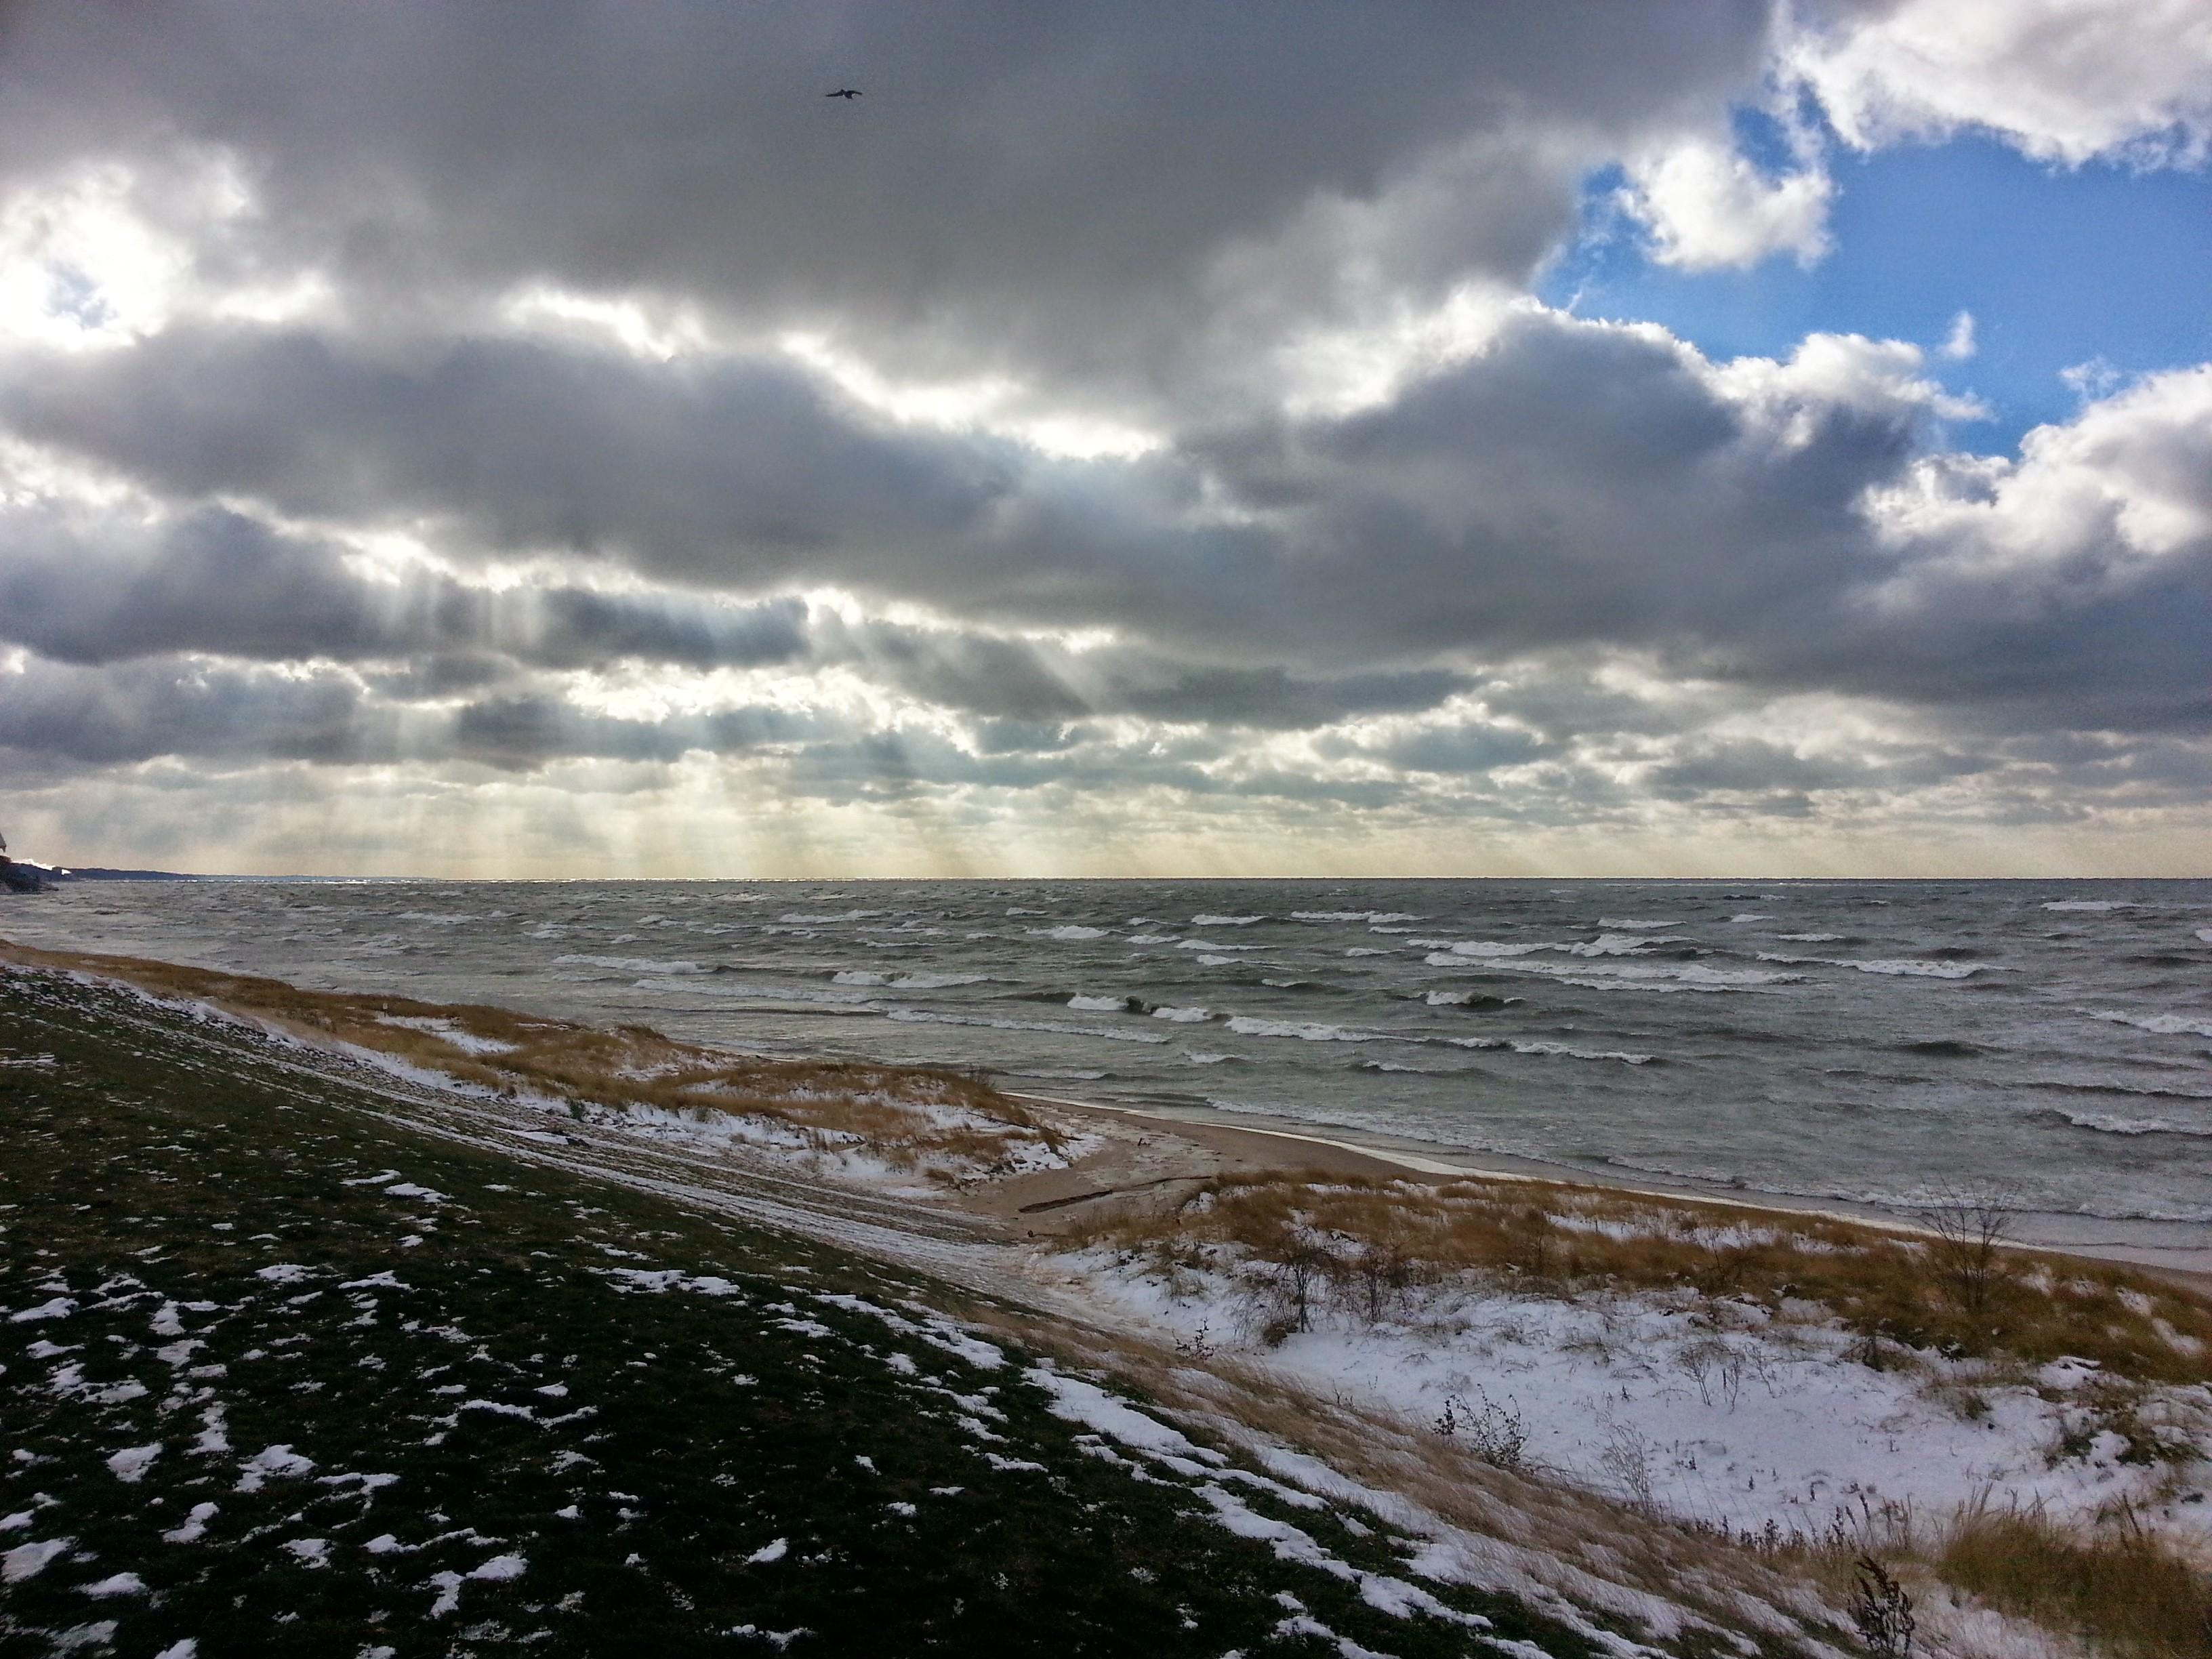 Lake Effect Snow in Southwest Michigan